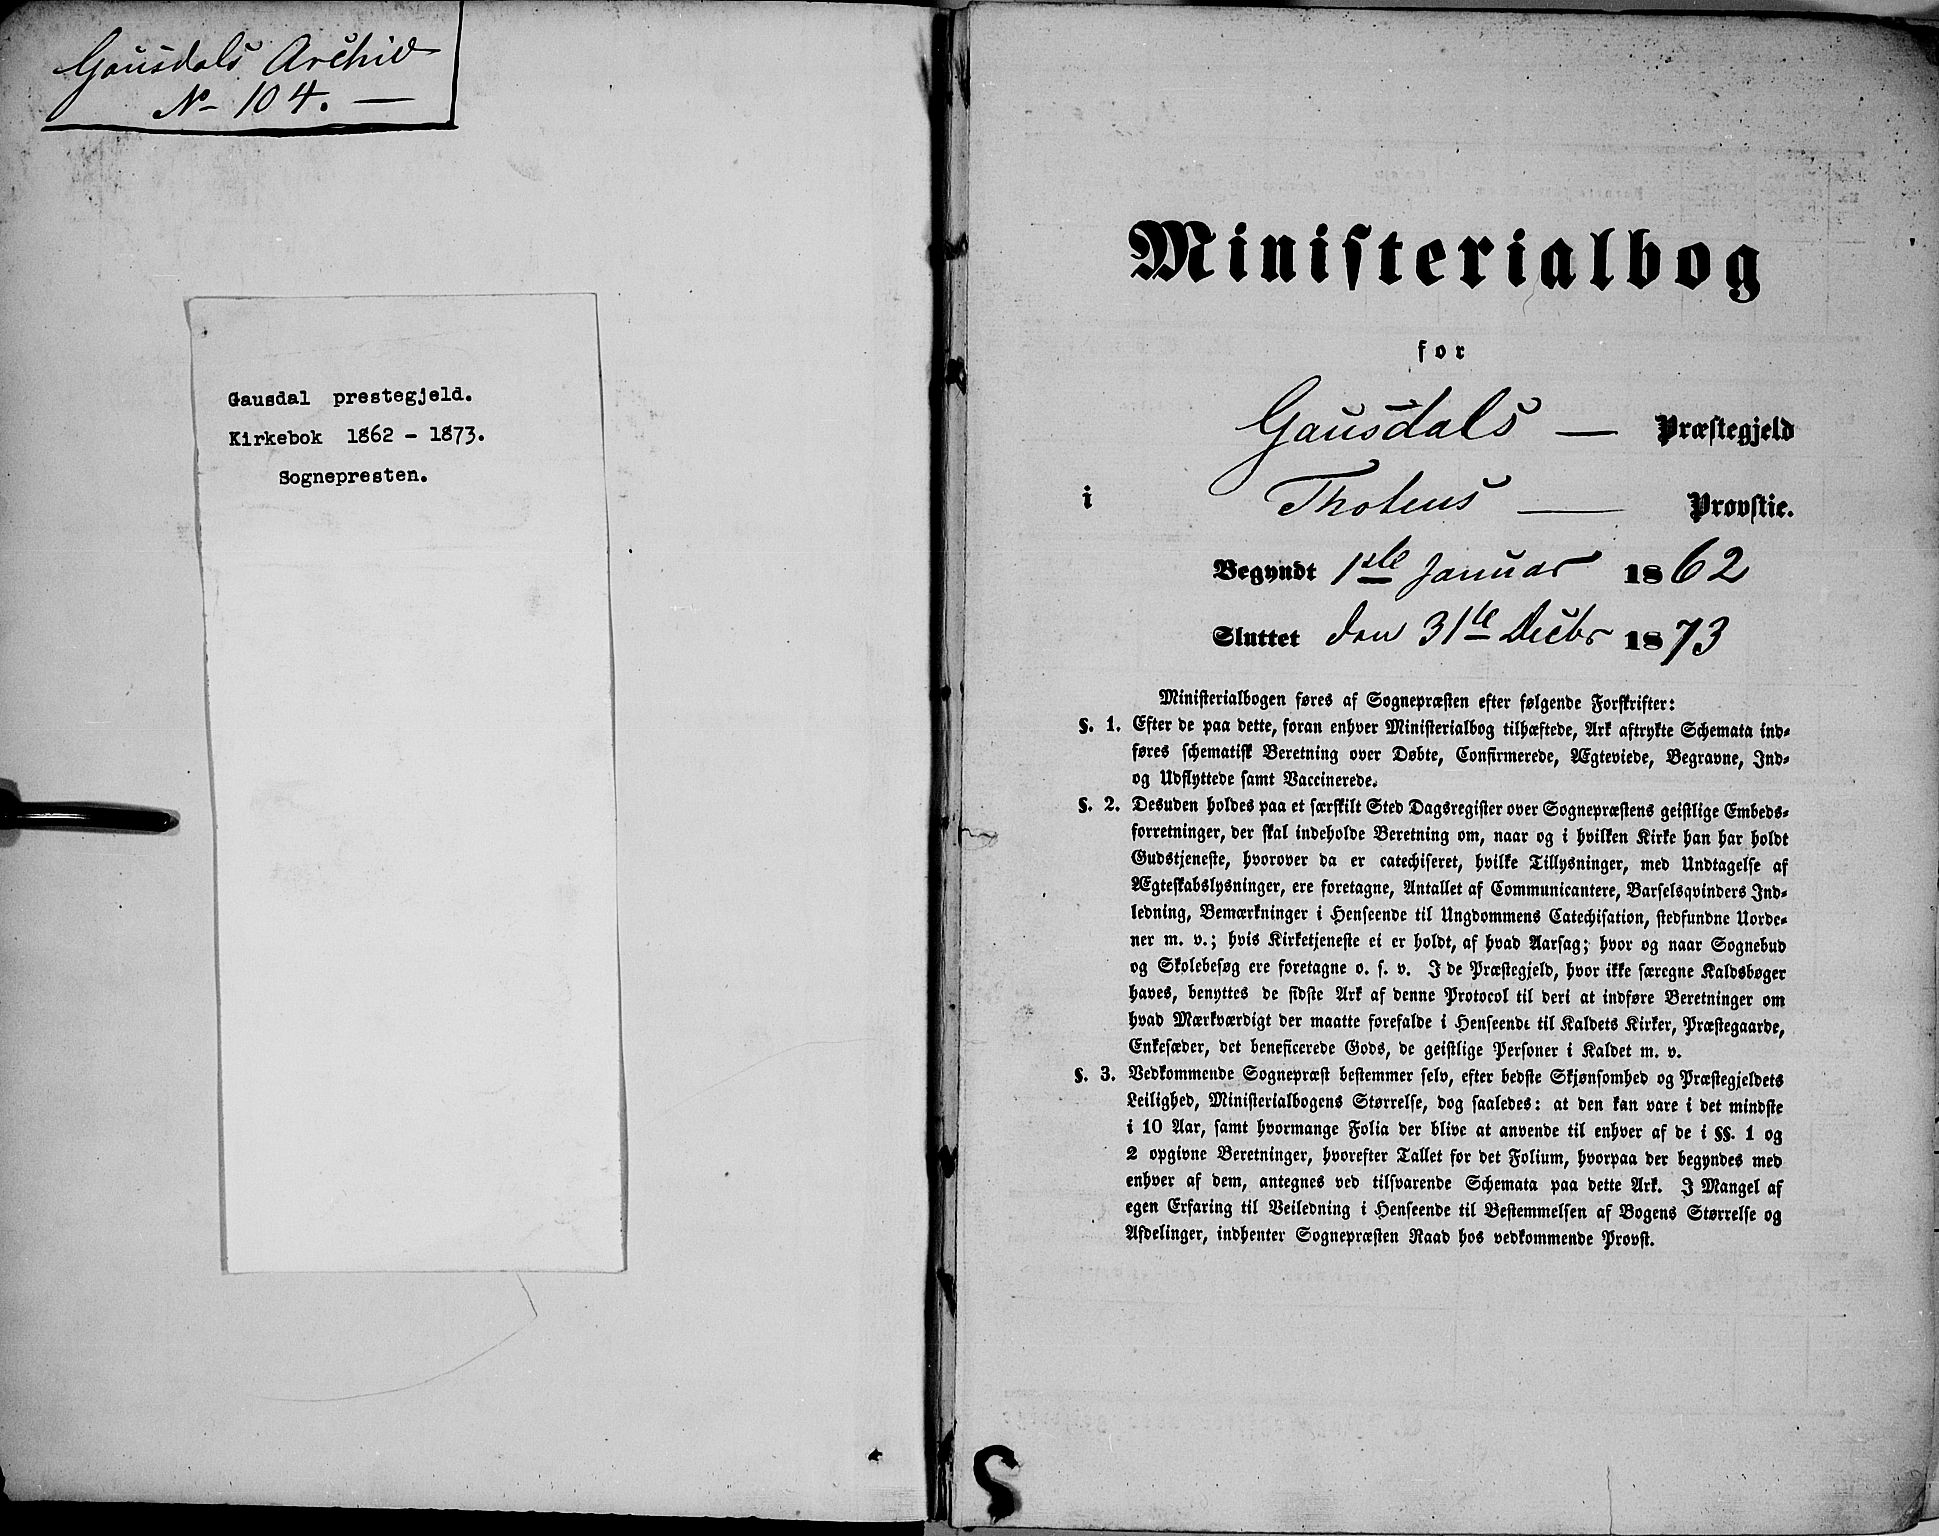 SAH, Gausdal prestekontor, Ministerialbok nr. 9, 1862-1873